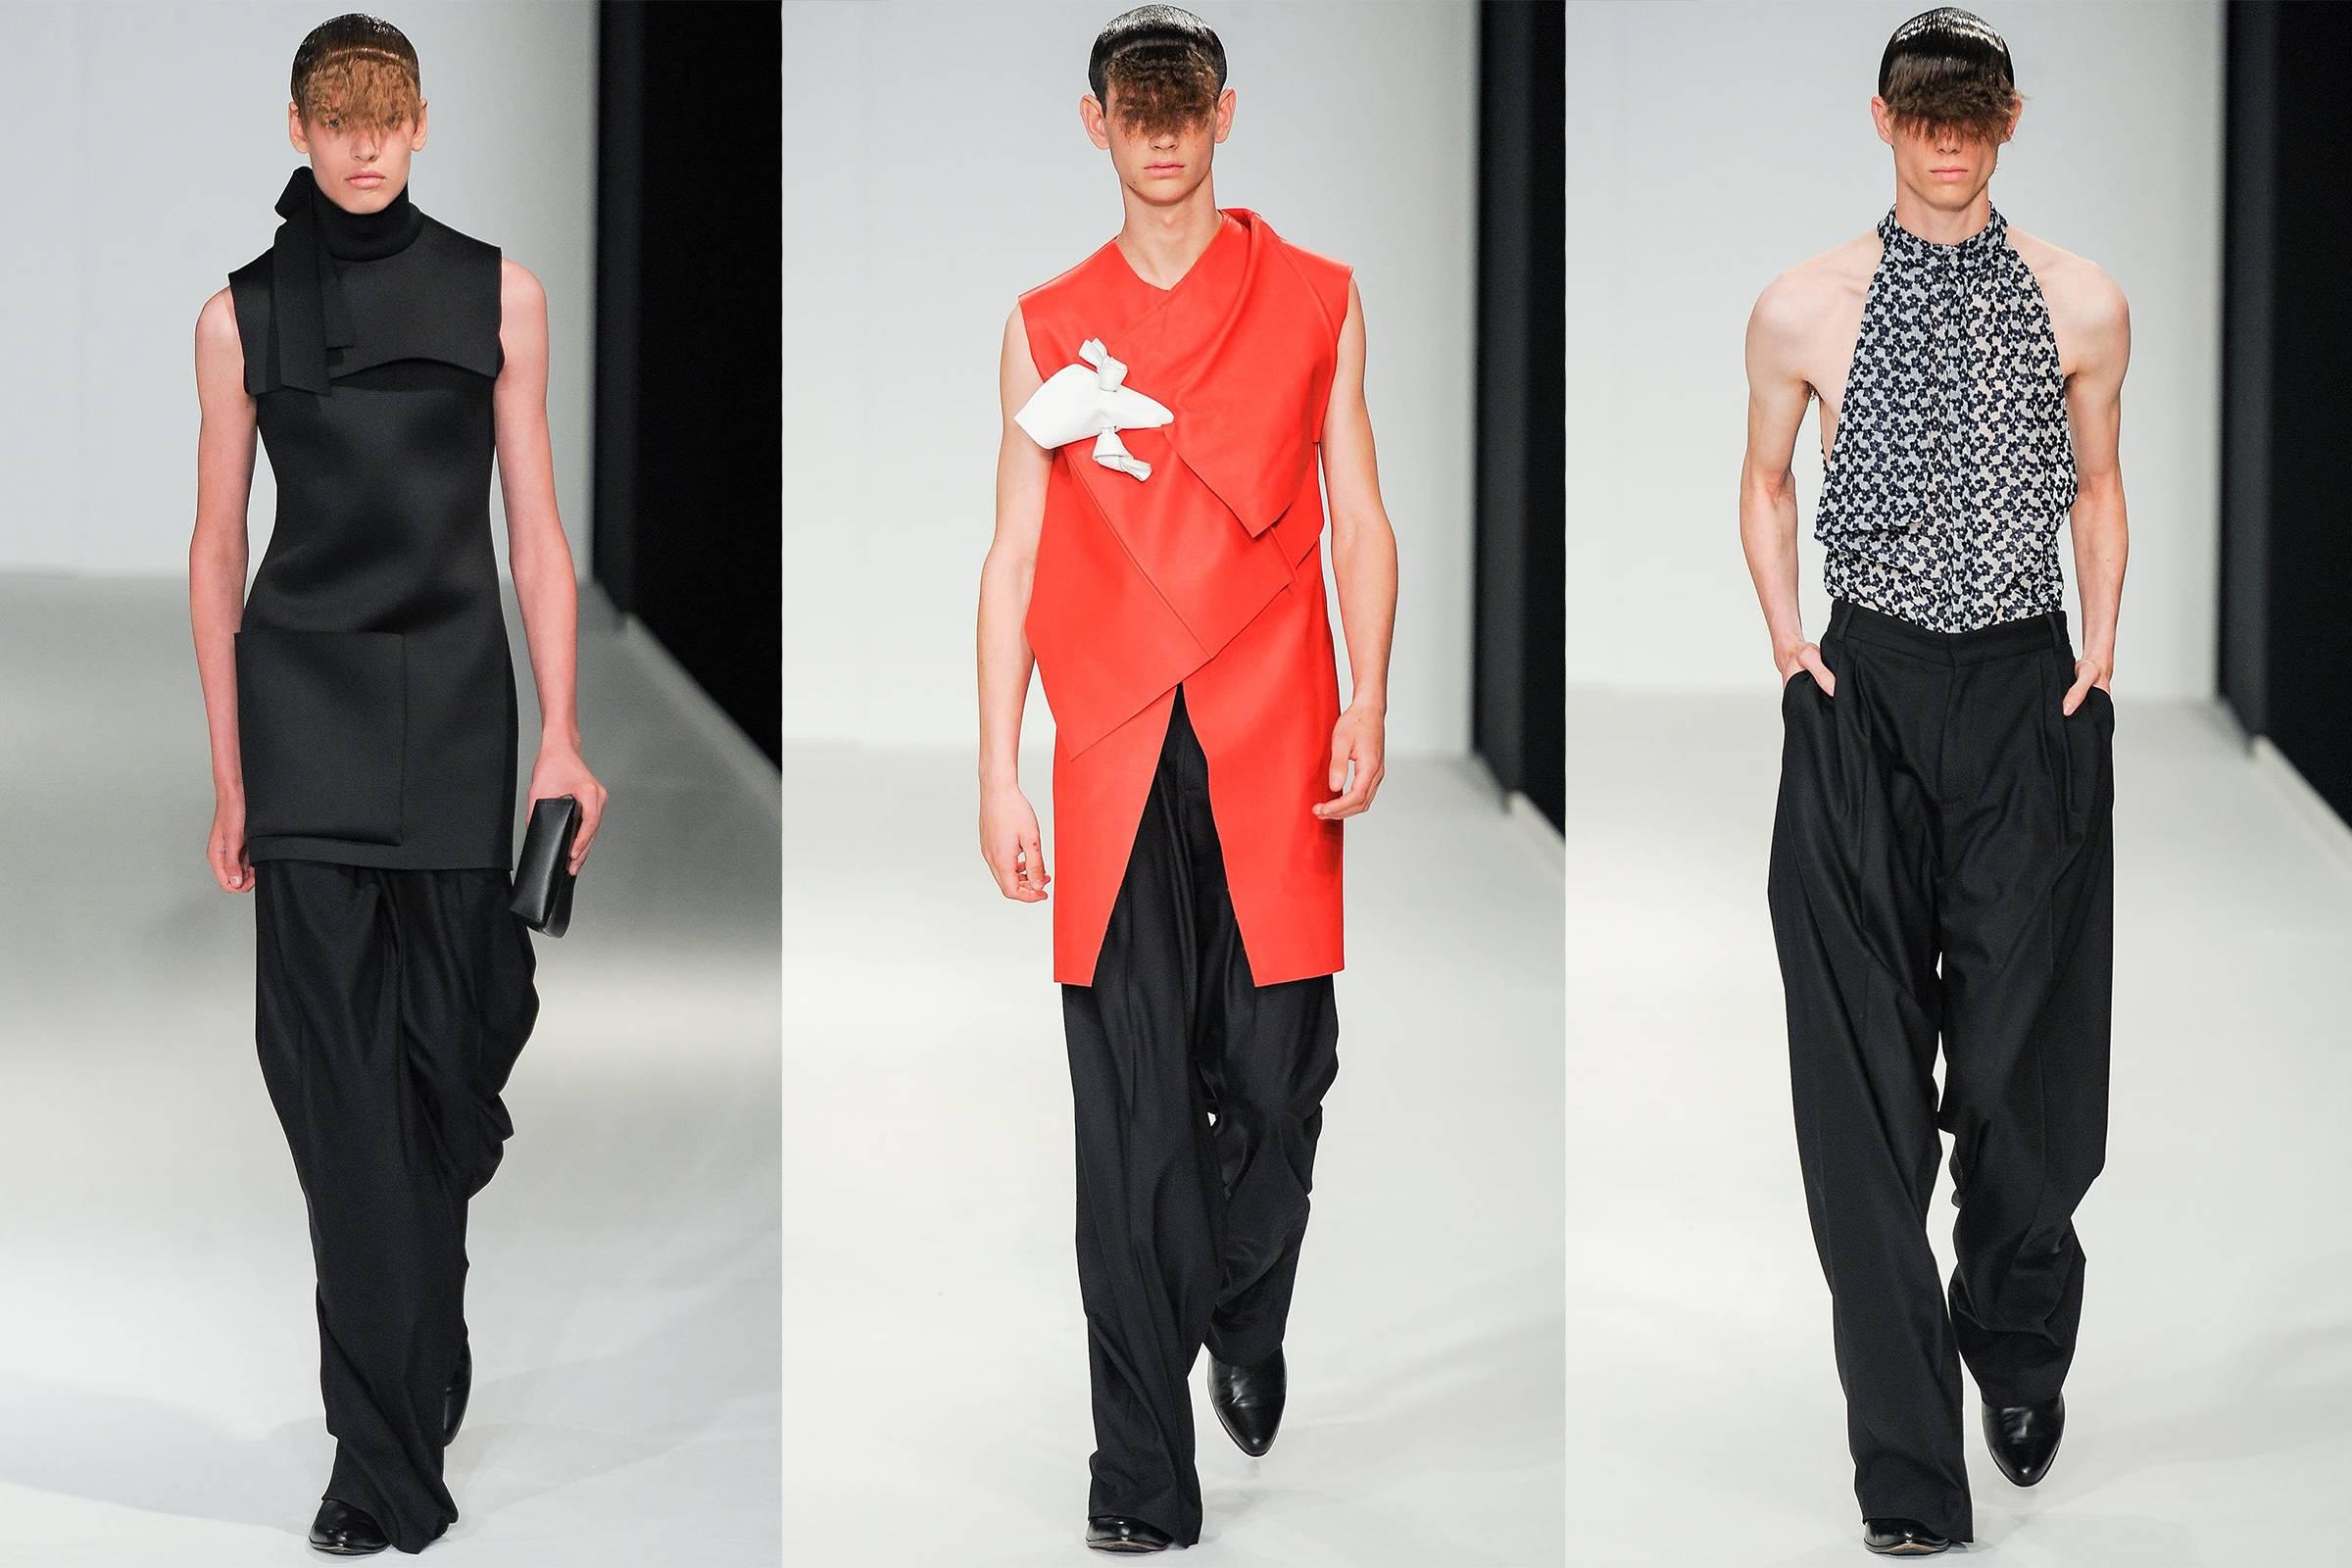 J.W. Anderson Spring/Summer 2014 Menswear